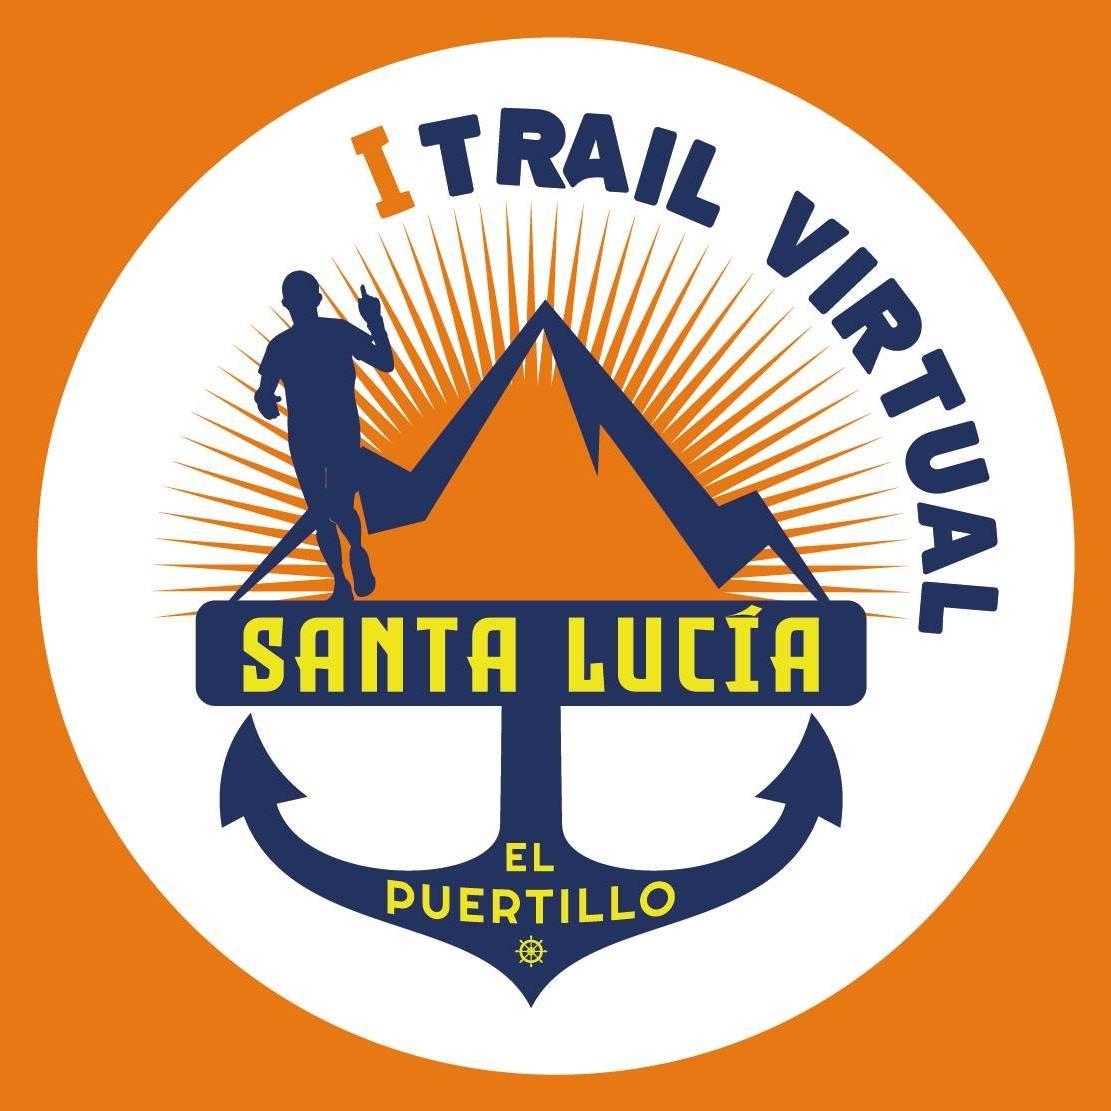 Logo Trail Santa Lucia El Puertillo 2020